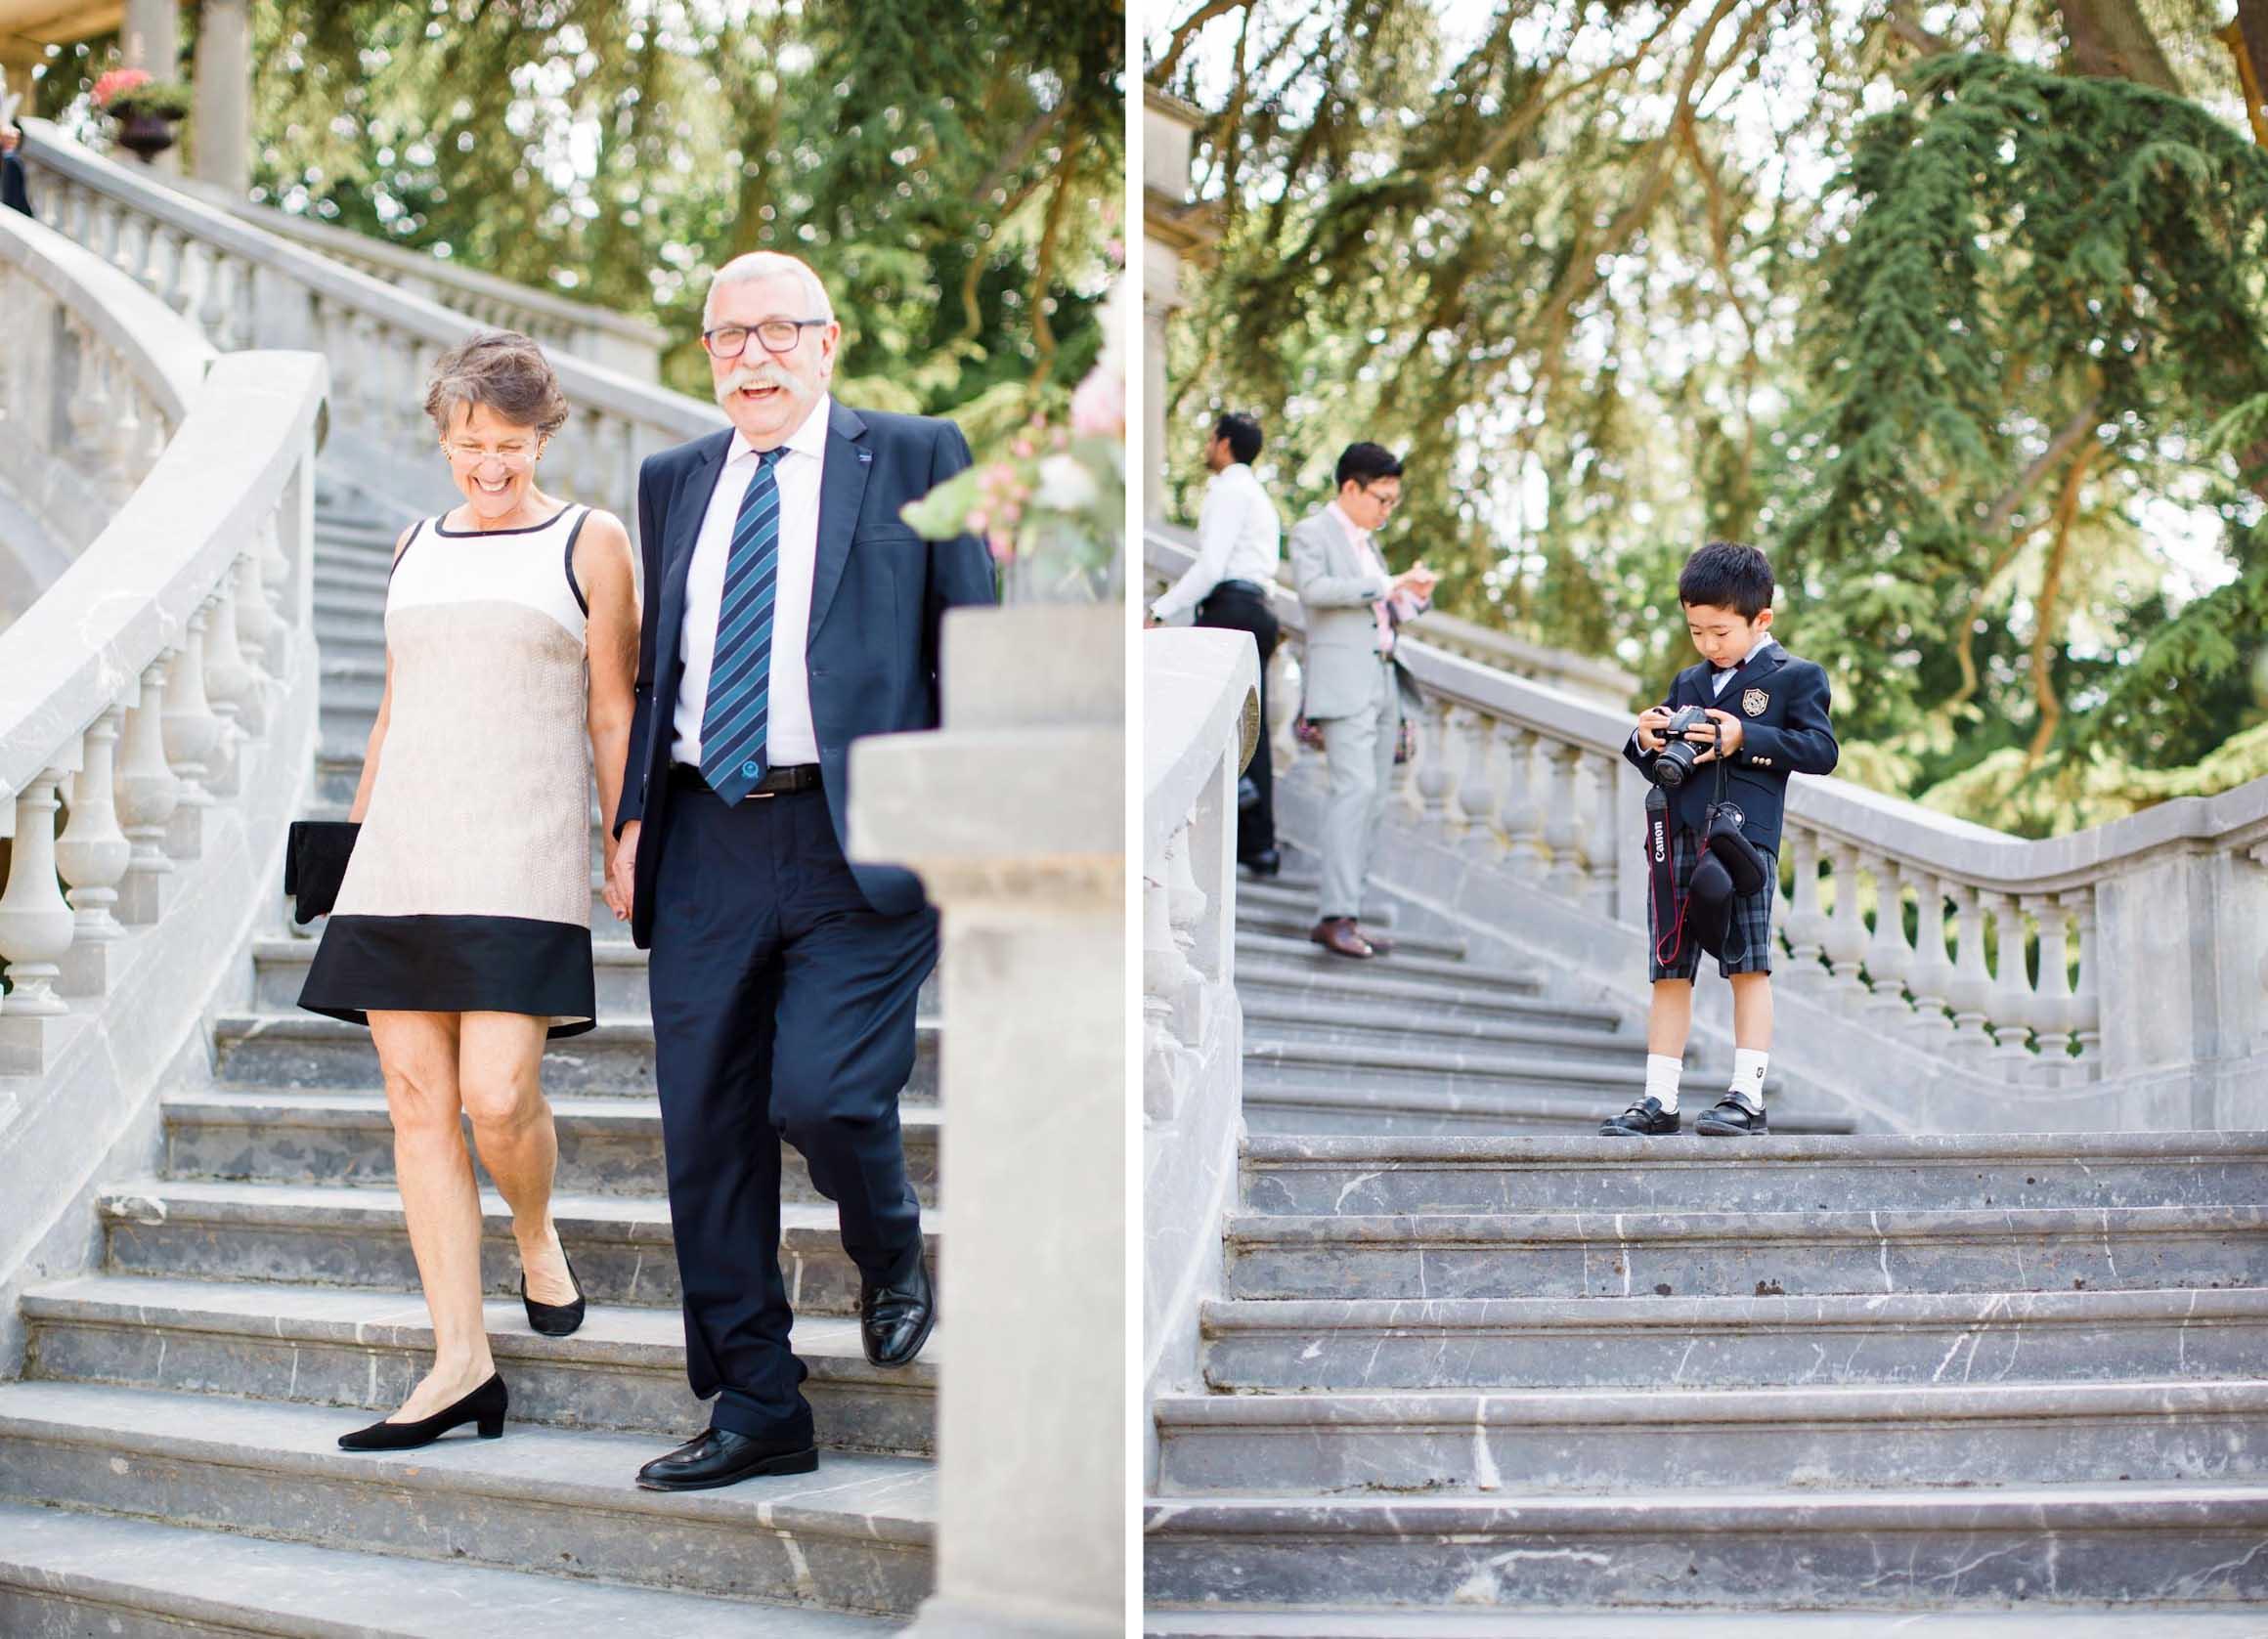 Amy O'Boyle Photography- Chateau Bouffemont Wedding- France Wedding Photographer 2.jpg